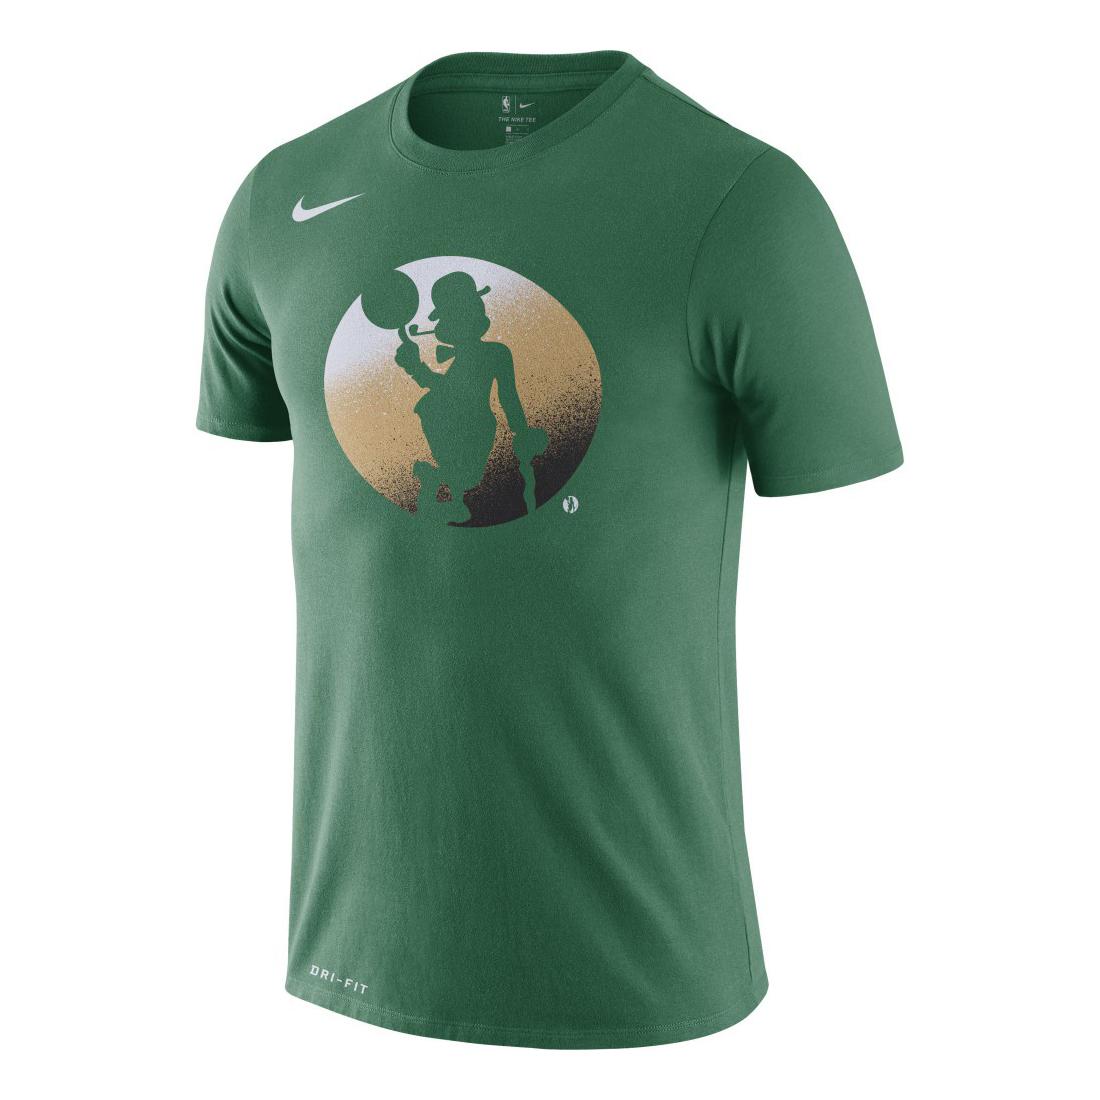 half off c618e b58a1 Nike NBA Boston Celtics Dri-FIT T-Shirt - NBA Shop Boston ...